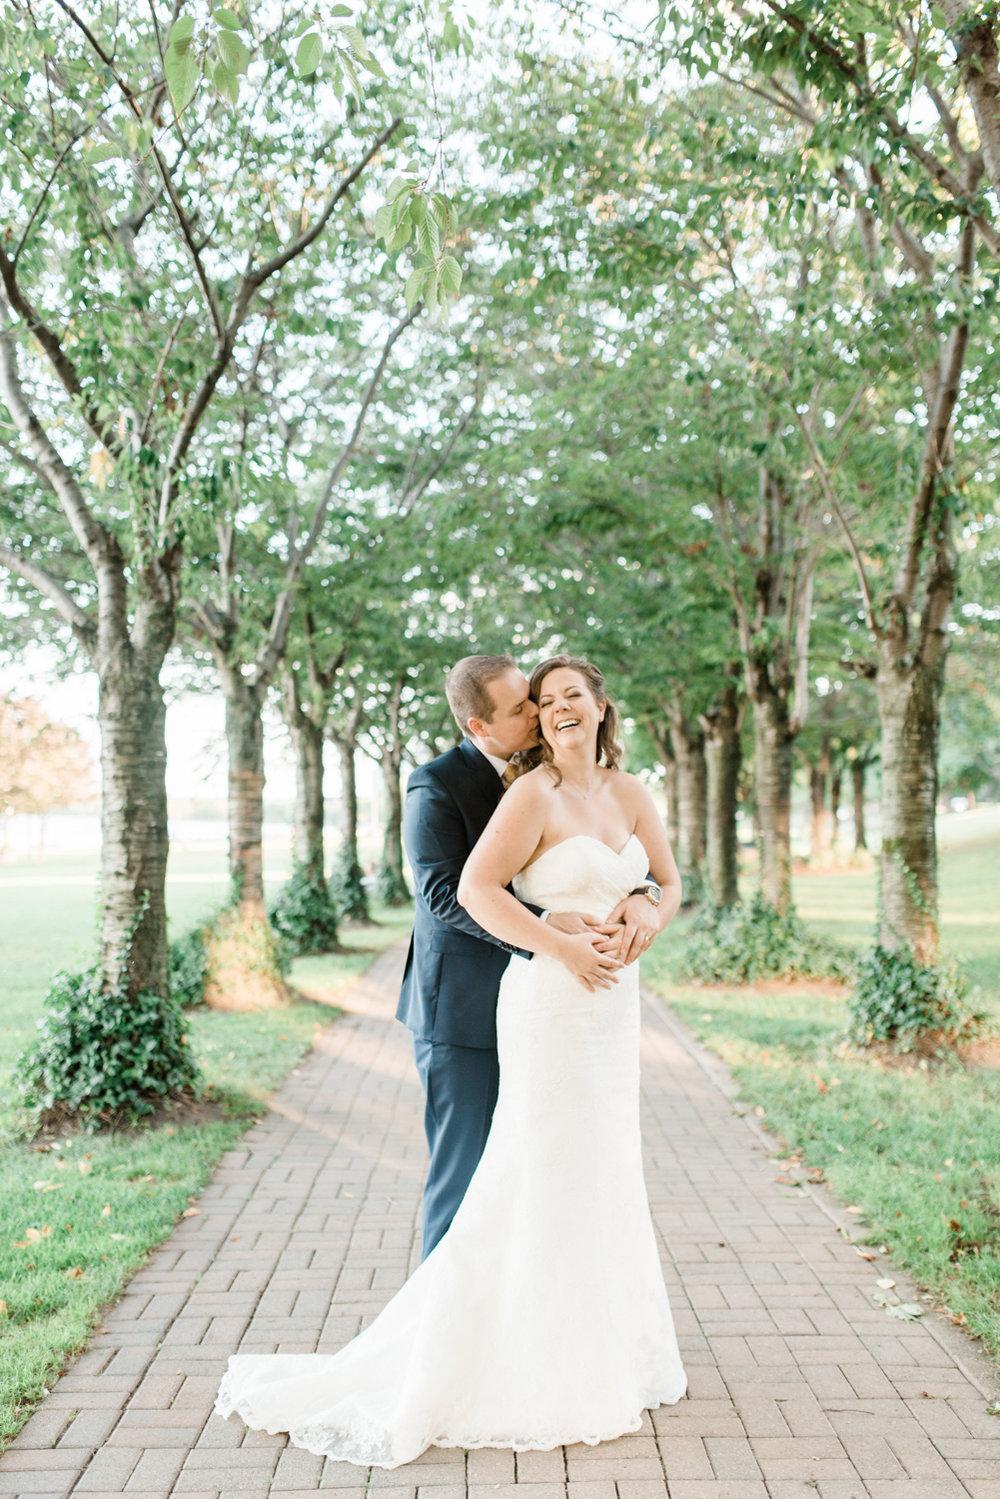 Hamilton Destination Wedding Photographer -91.jpg